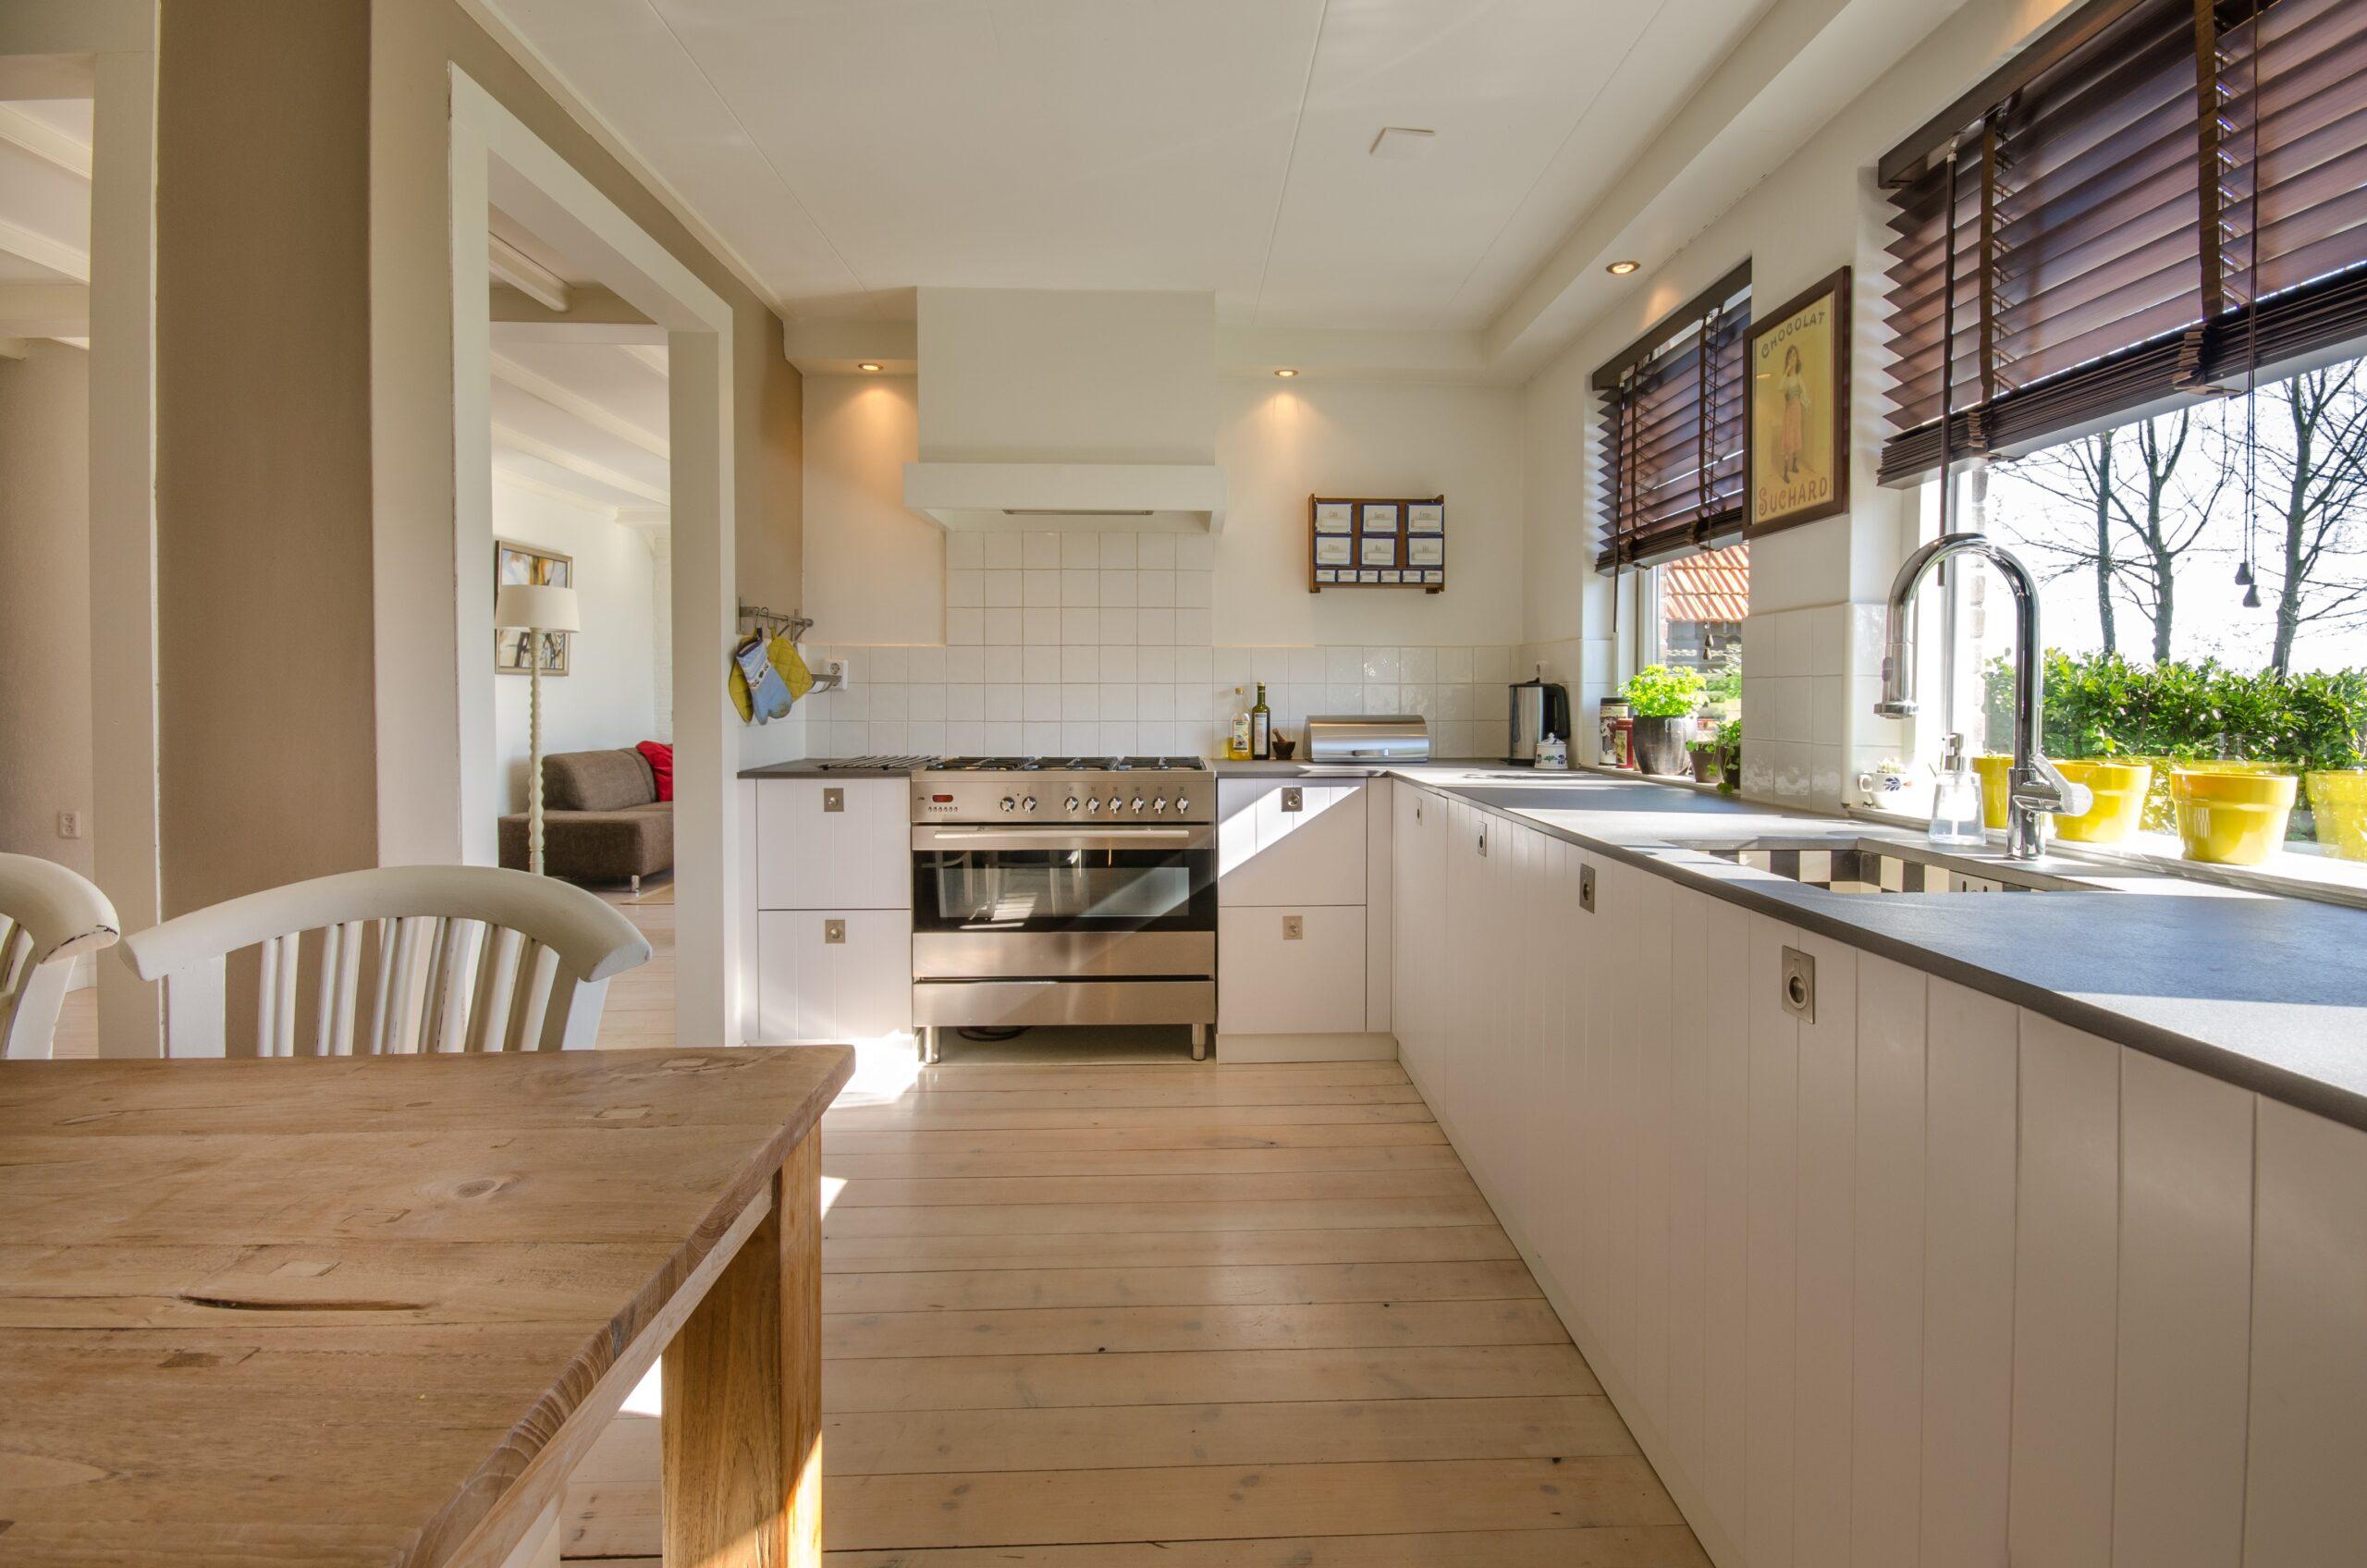 home remodel, home repair nodat nashville